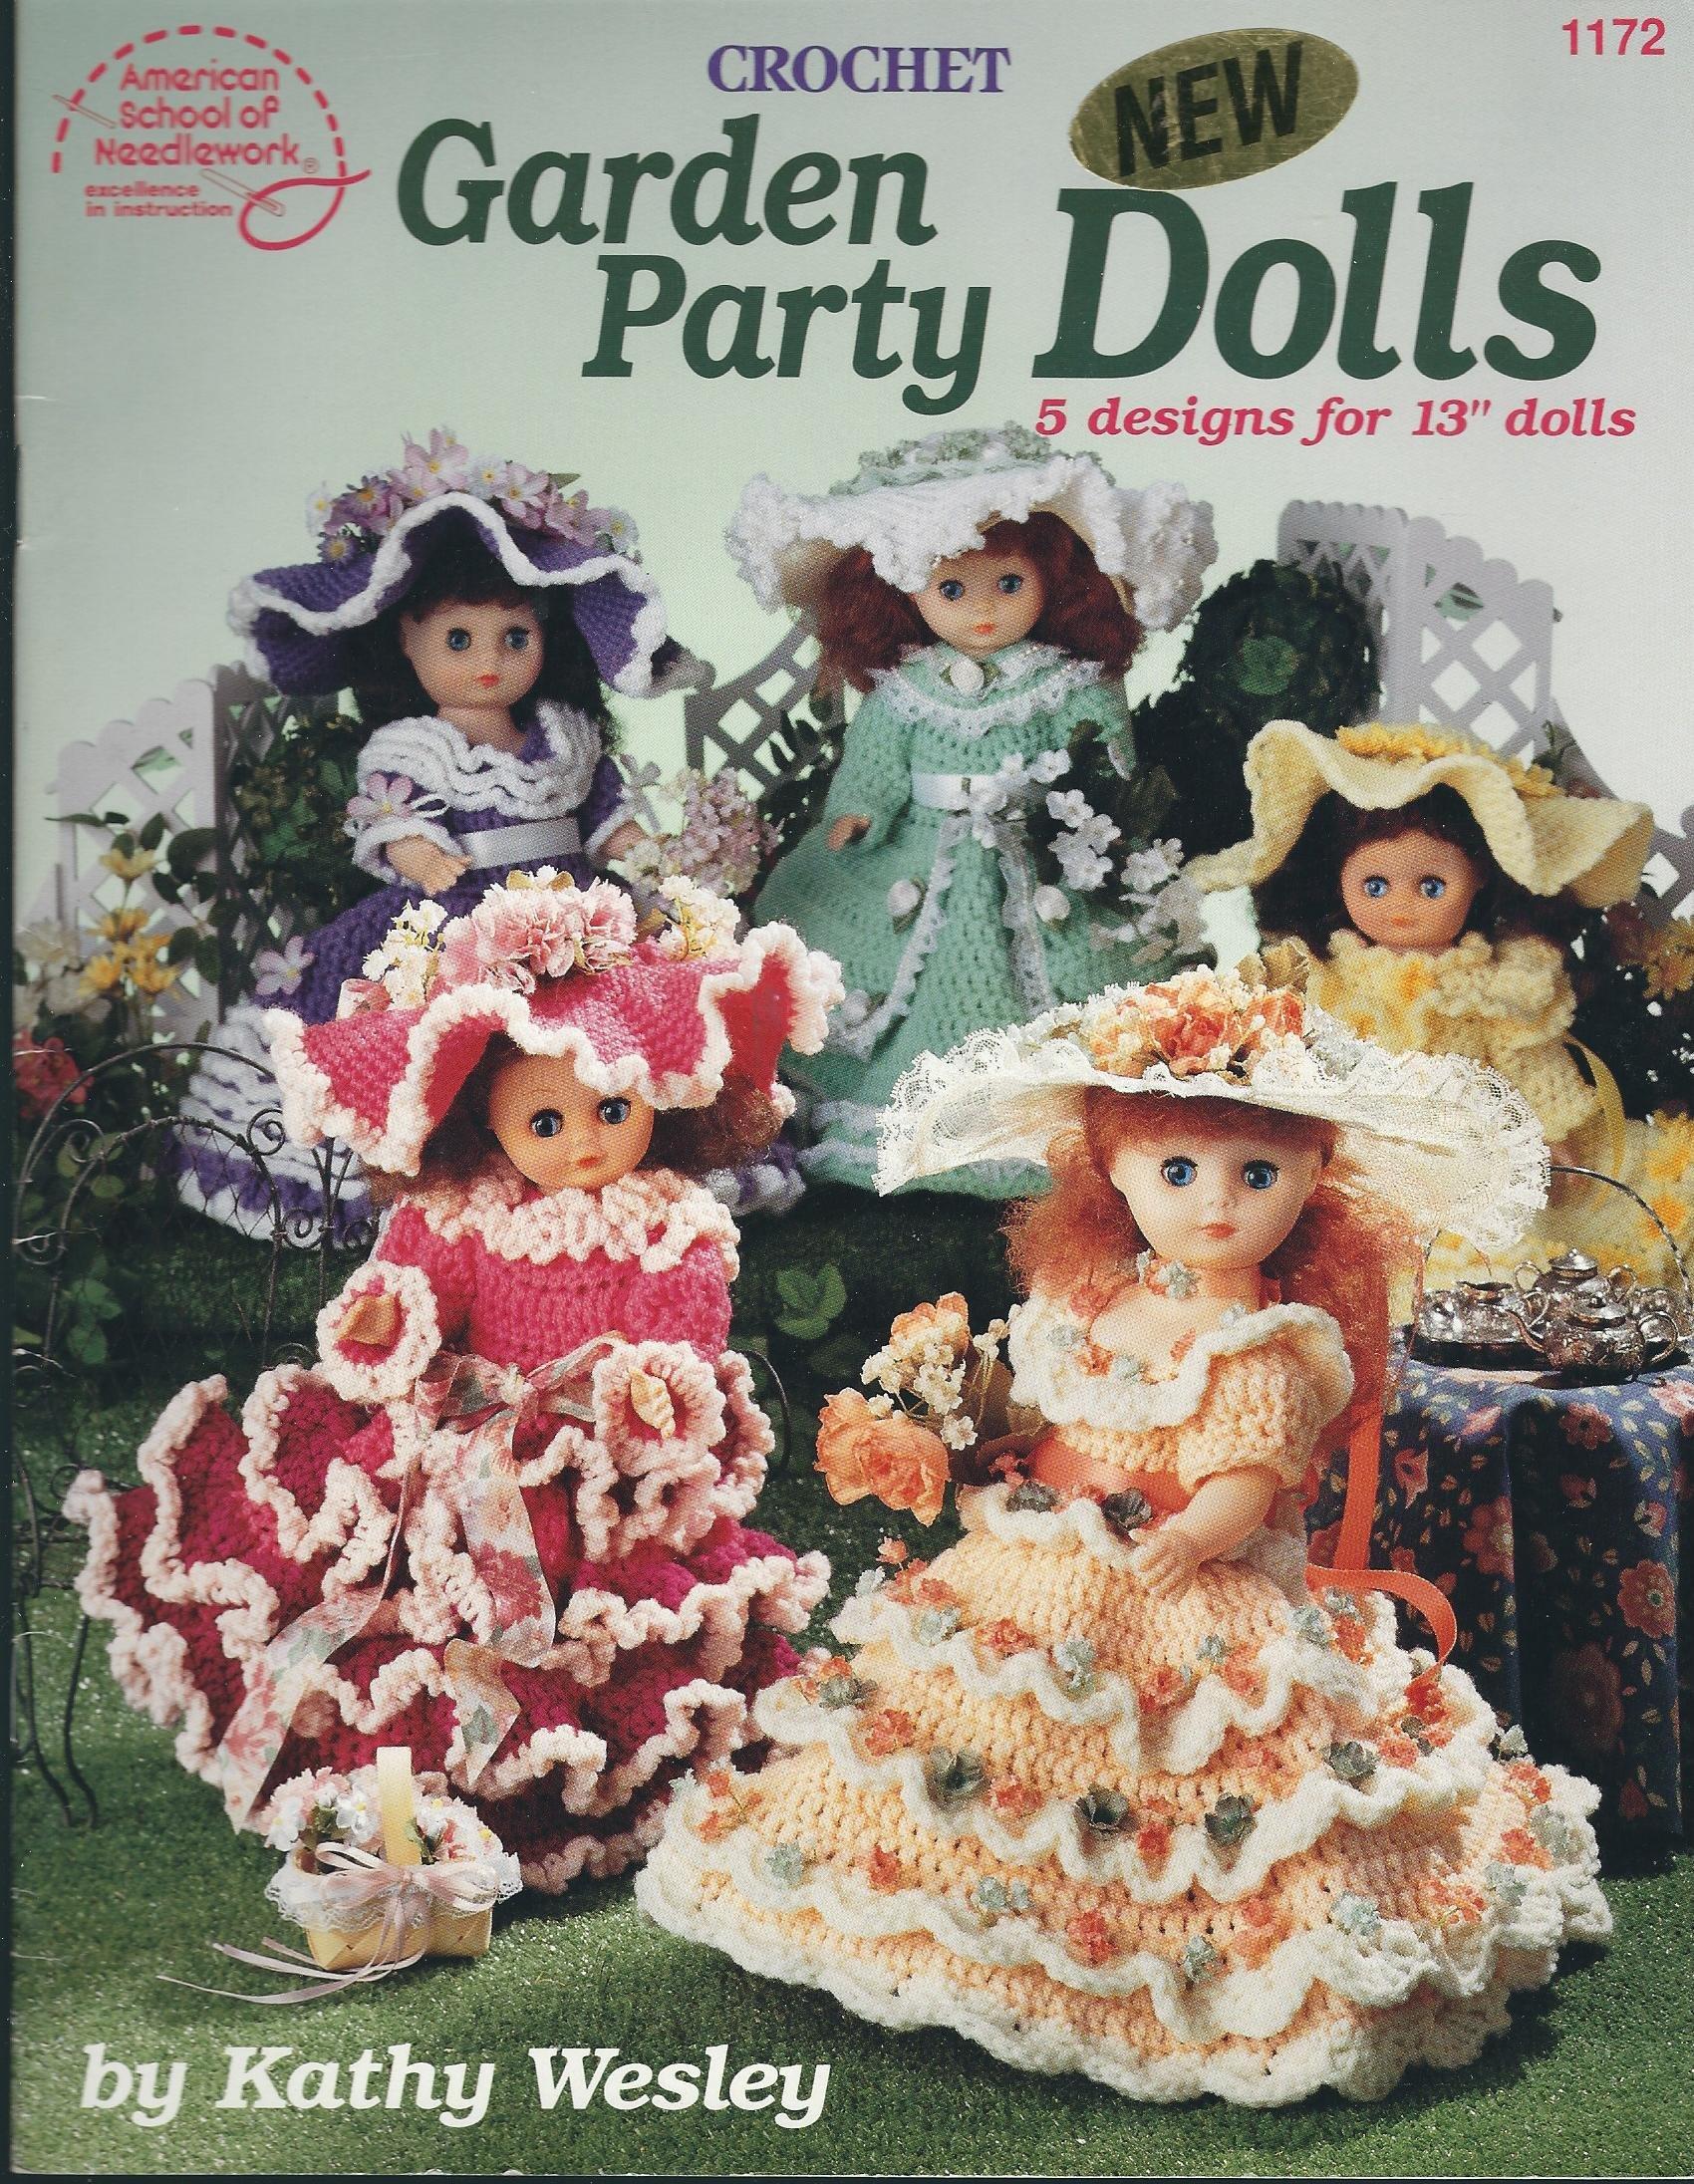 garden-party-dolls-5-crochet-designs-for-13-dolls